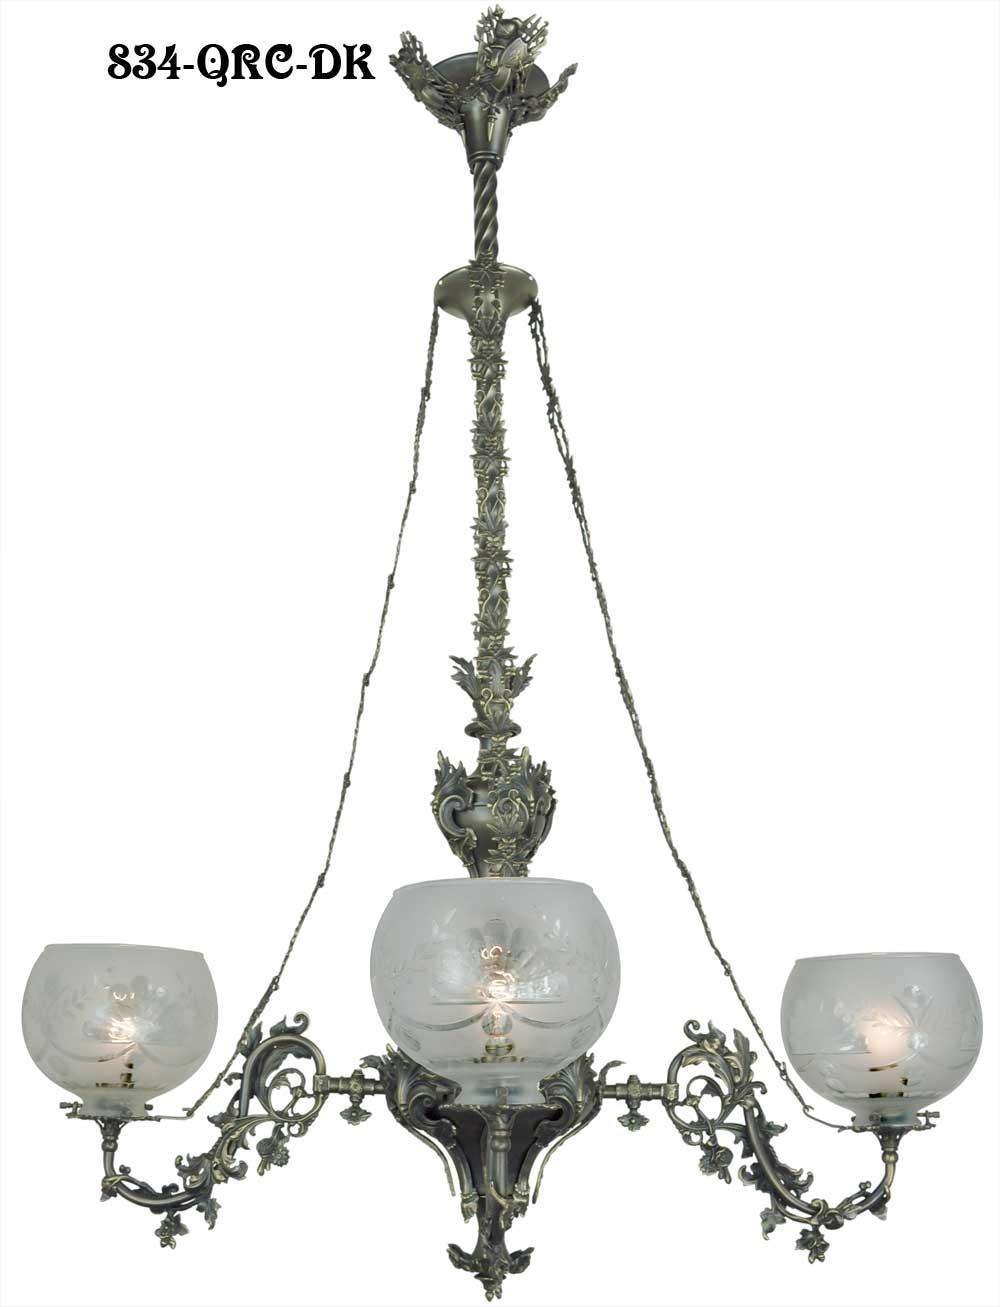 victorian chandelier neo rococo c 1840 gasolier 4 arm light 834 qrc ch